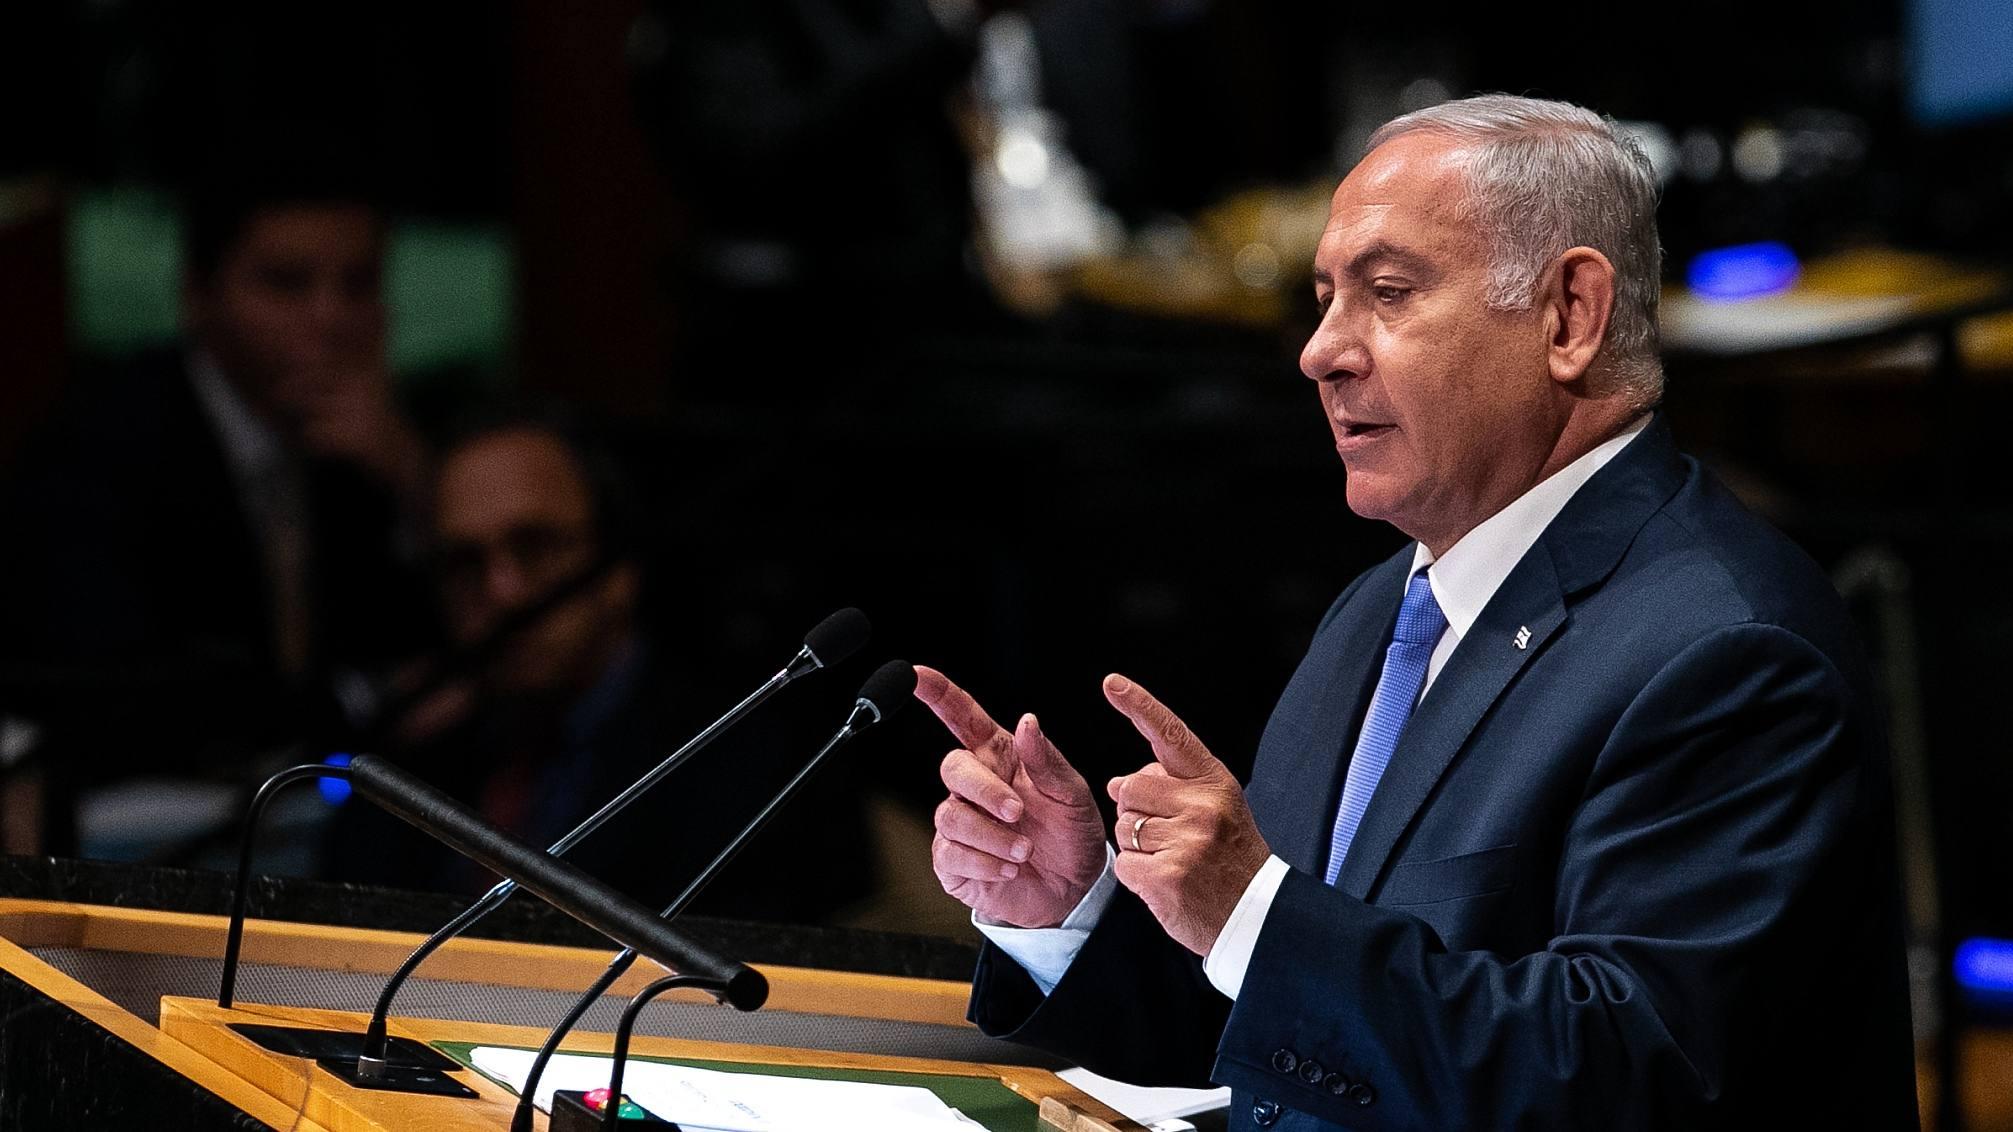 Netanyahu ally resigns as speaker of Israeli parliament: statement